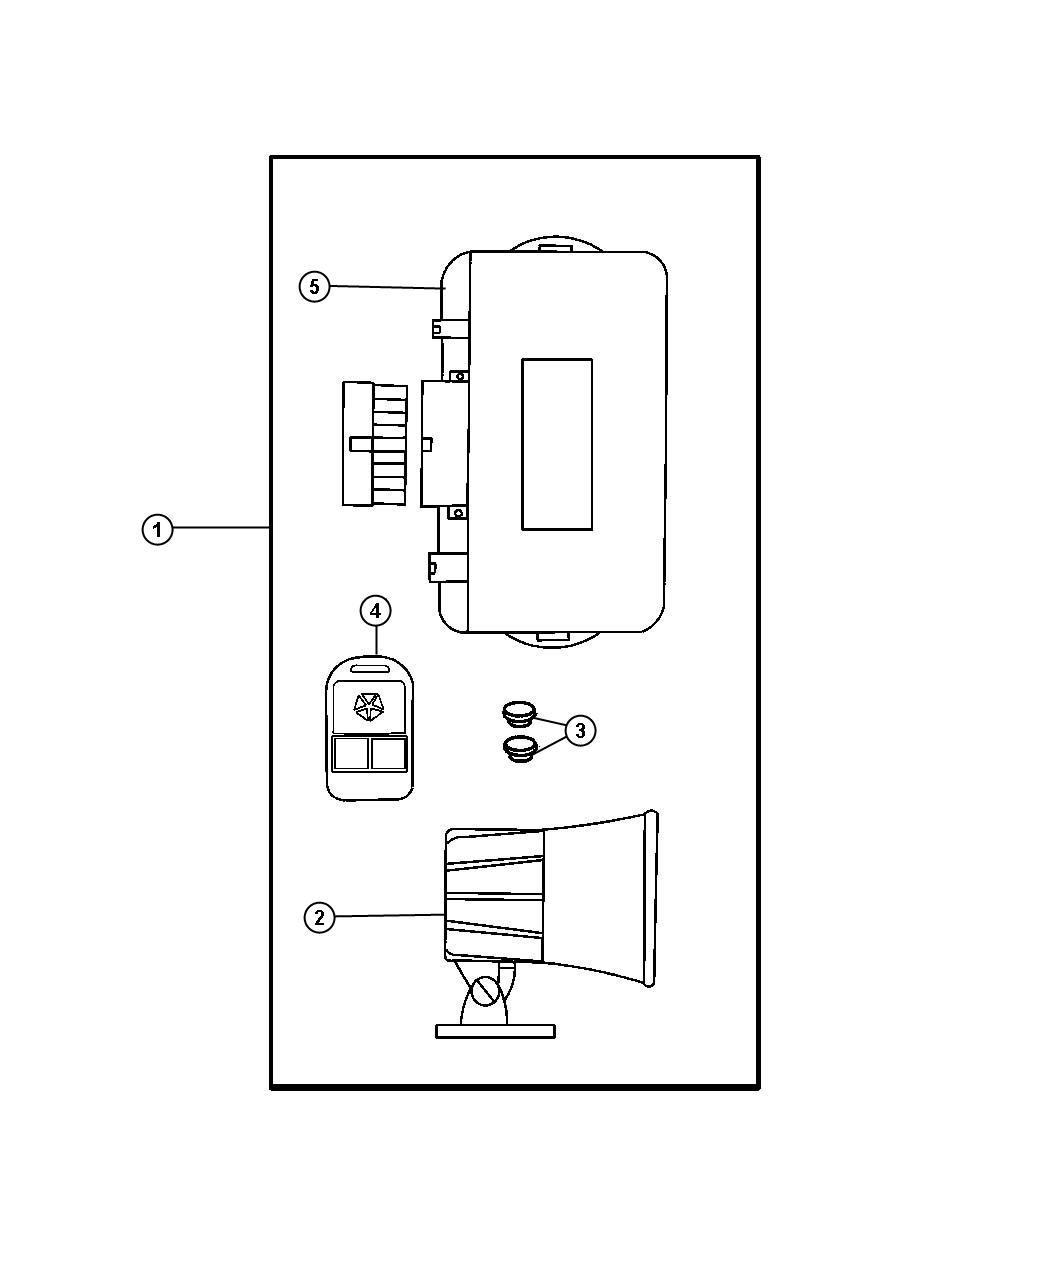 Chrysler Pt Cruiser Module Security Alarm W O Keyless